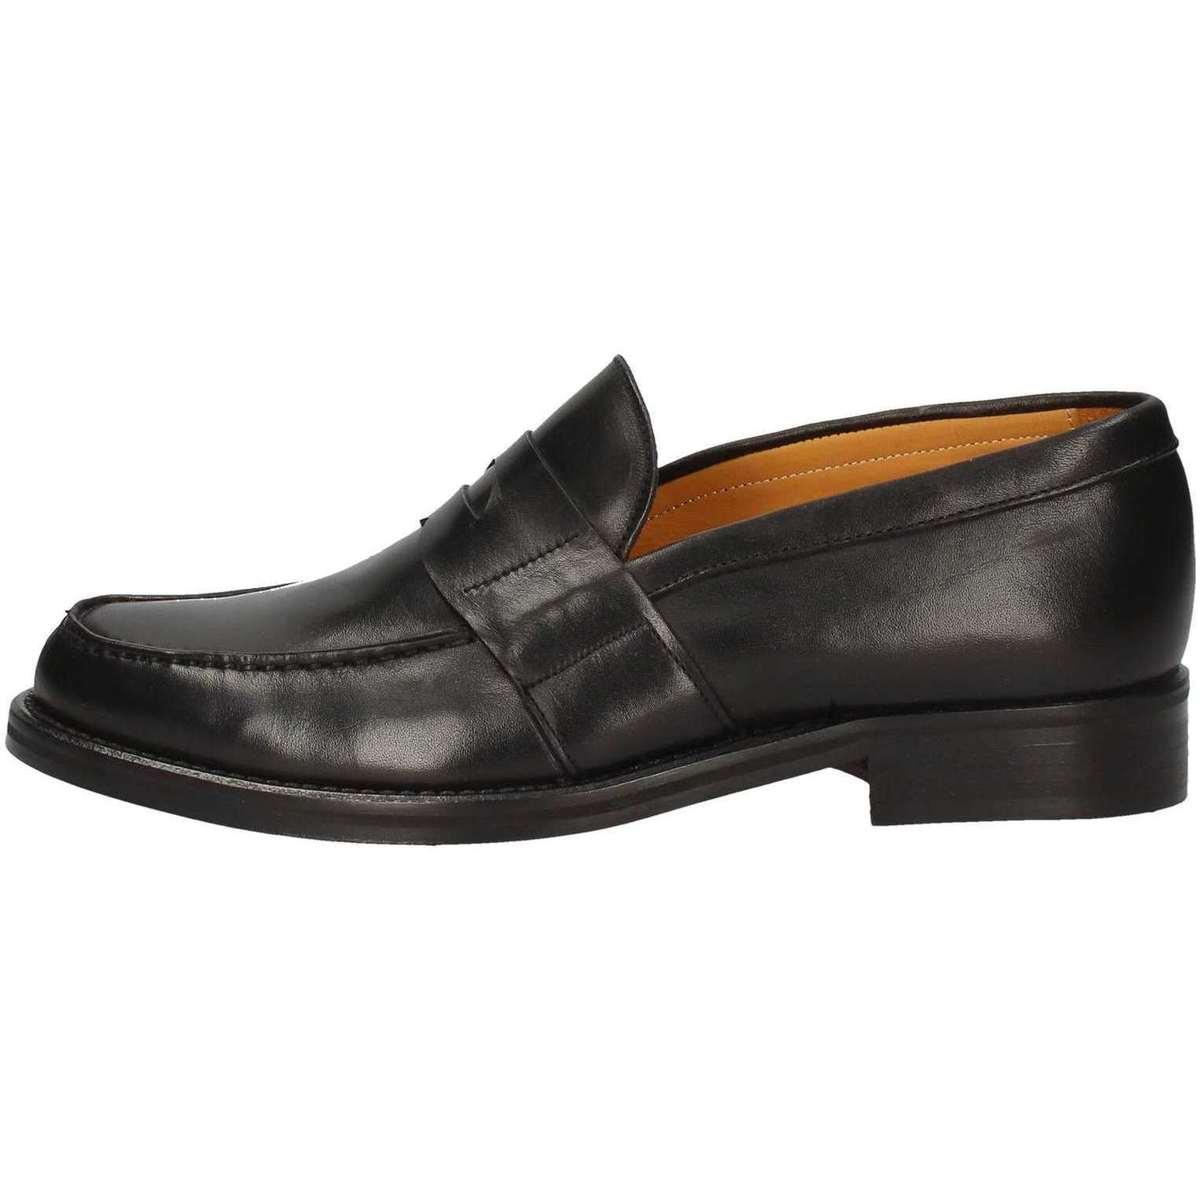 Hudson F08 Mokassin Mann Schwarz Schwarz - Schuhe Slipper Herren 112,10 €